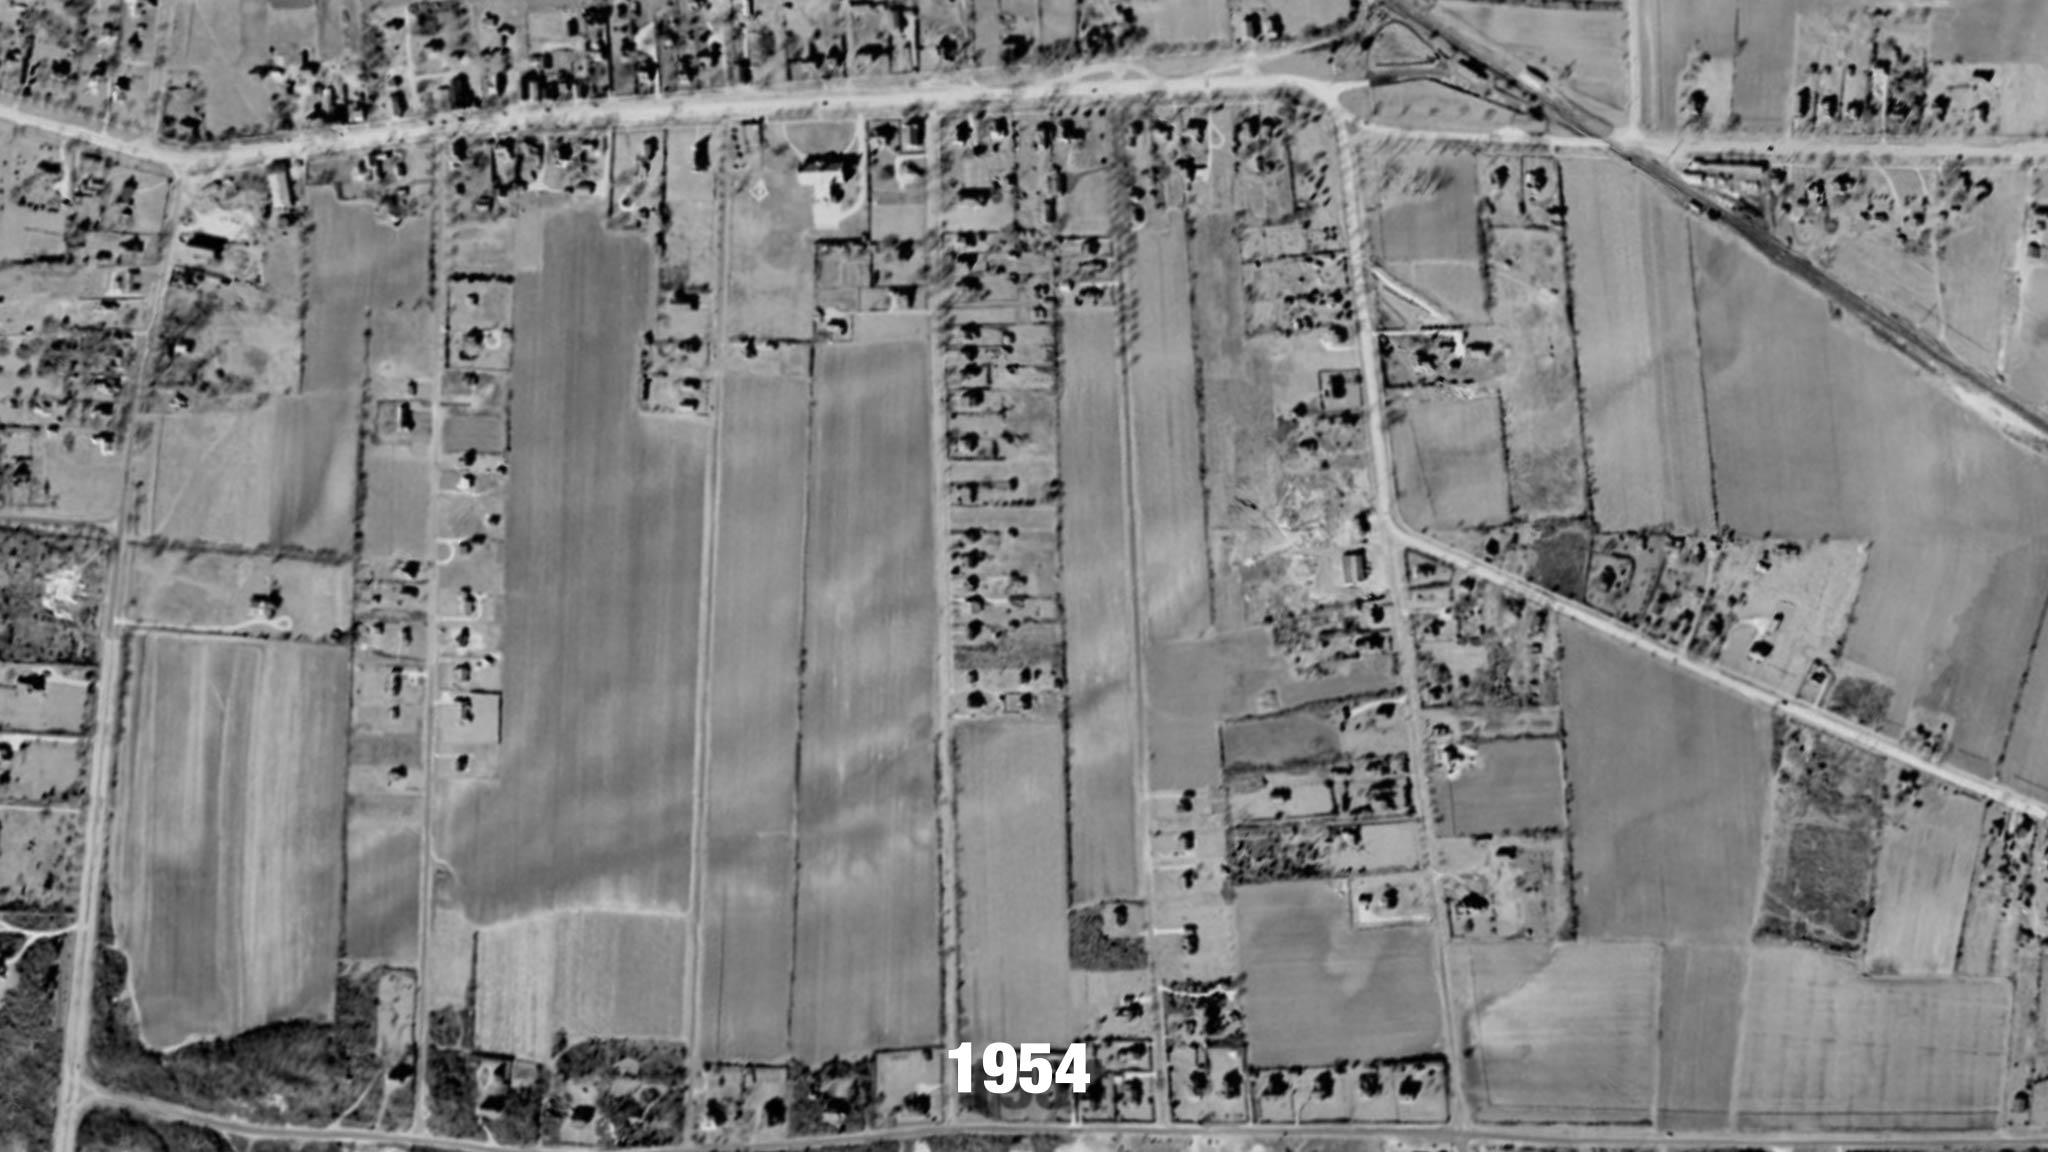 C_OBH_Hamptons_Satellite_2k_Static_03_Before_Year.jpg